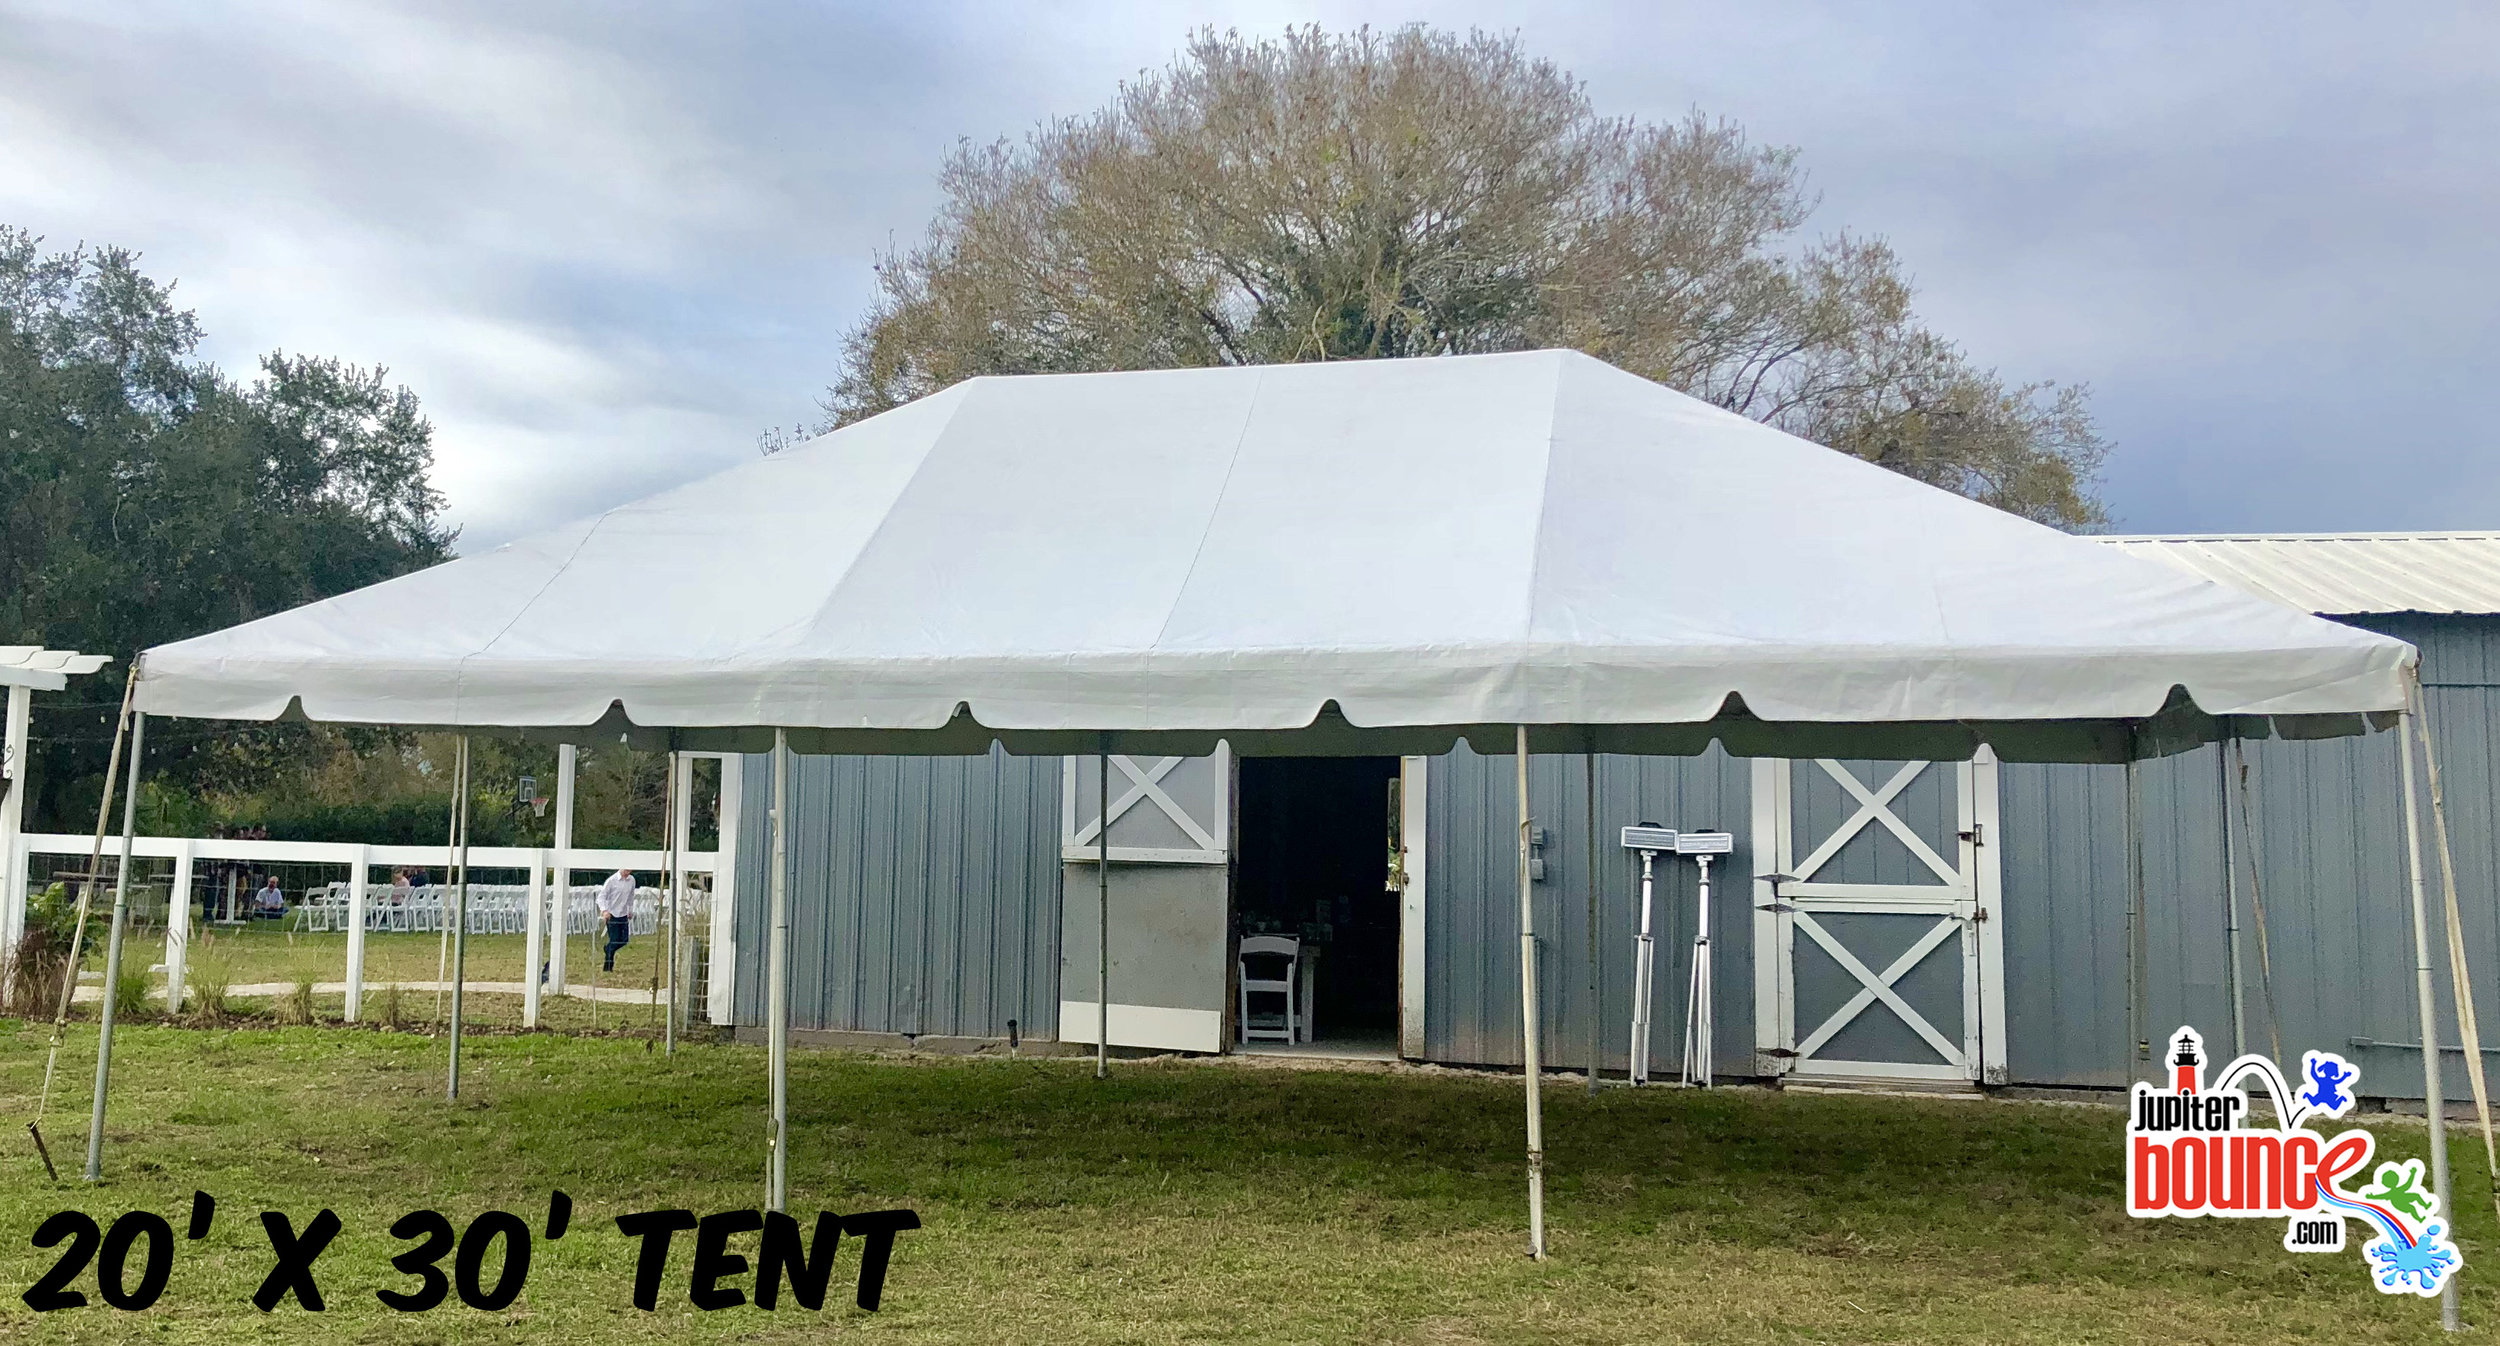 20x30 tent.jpg